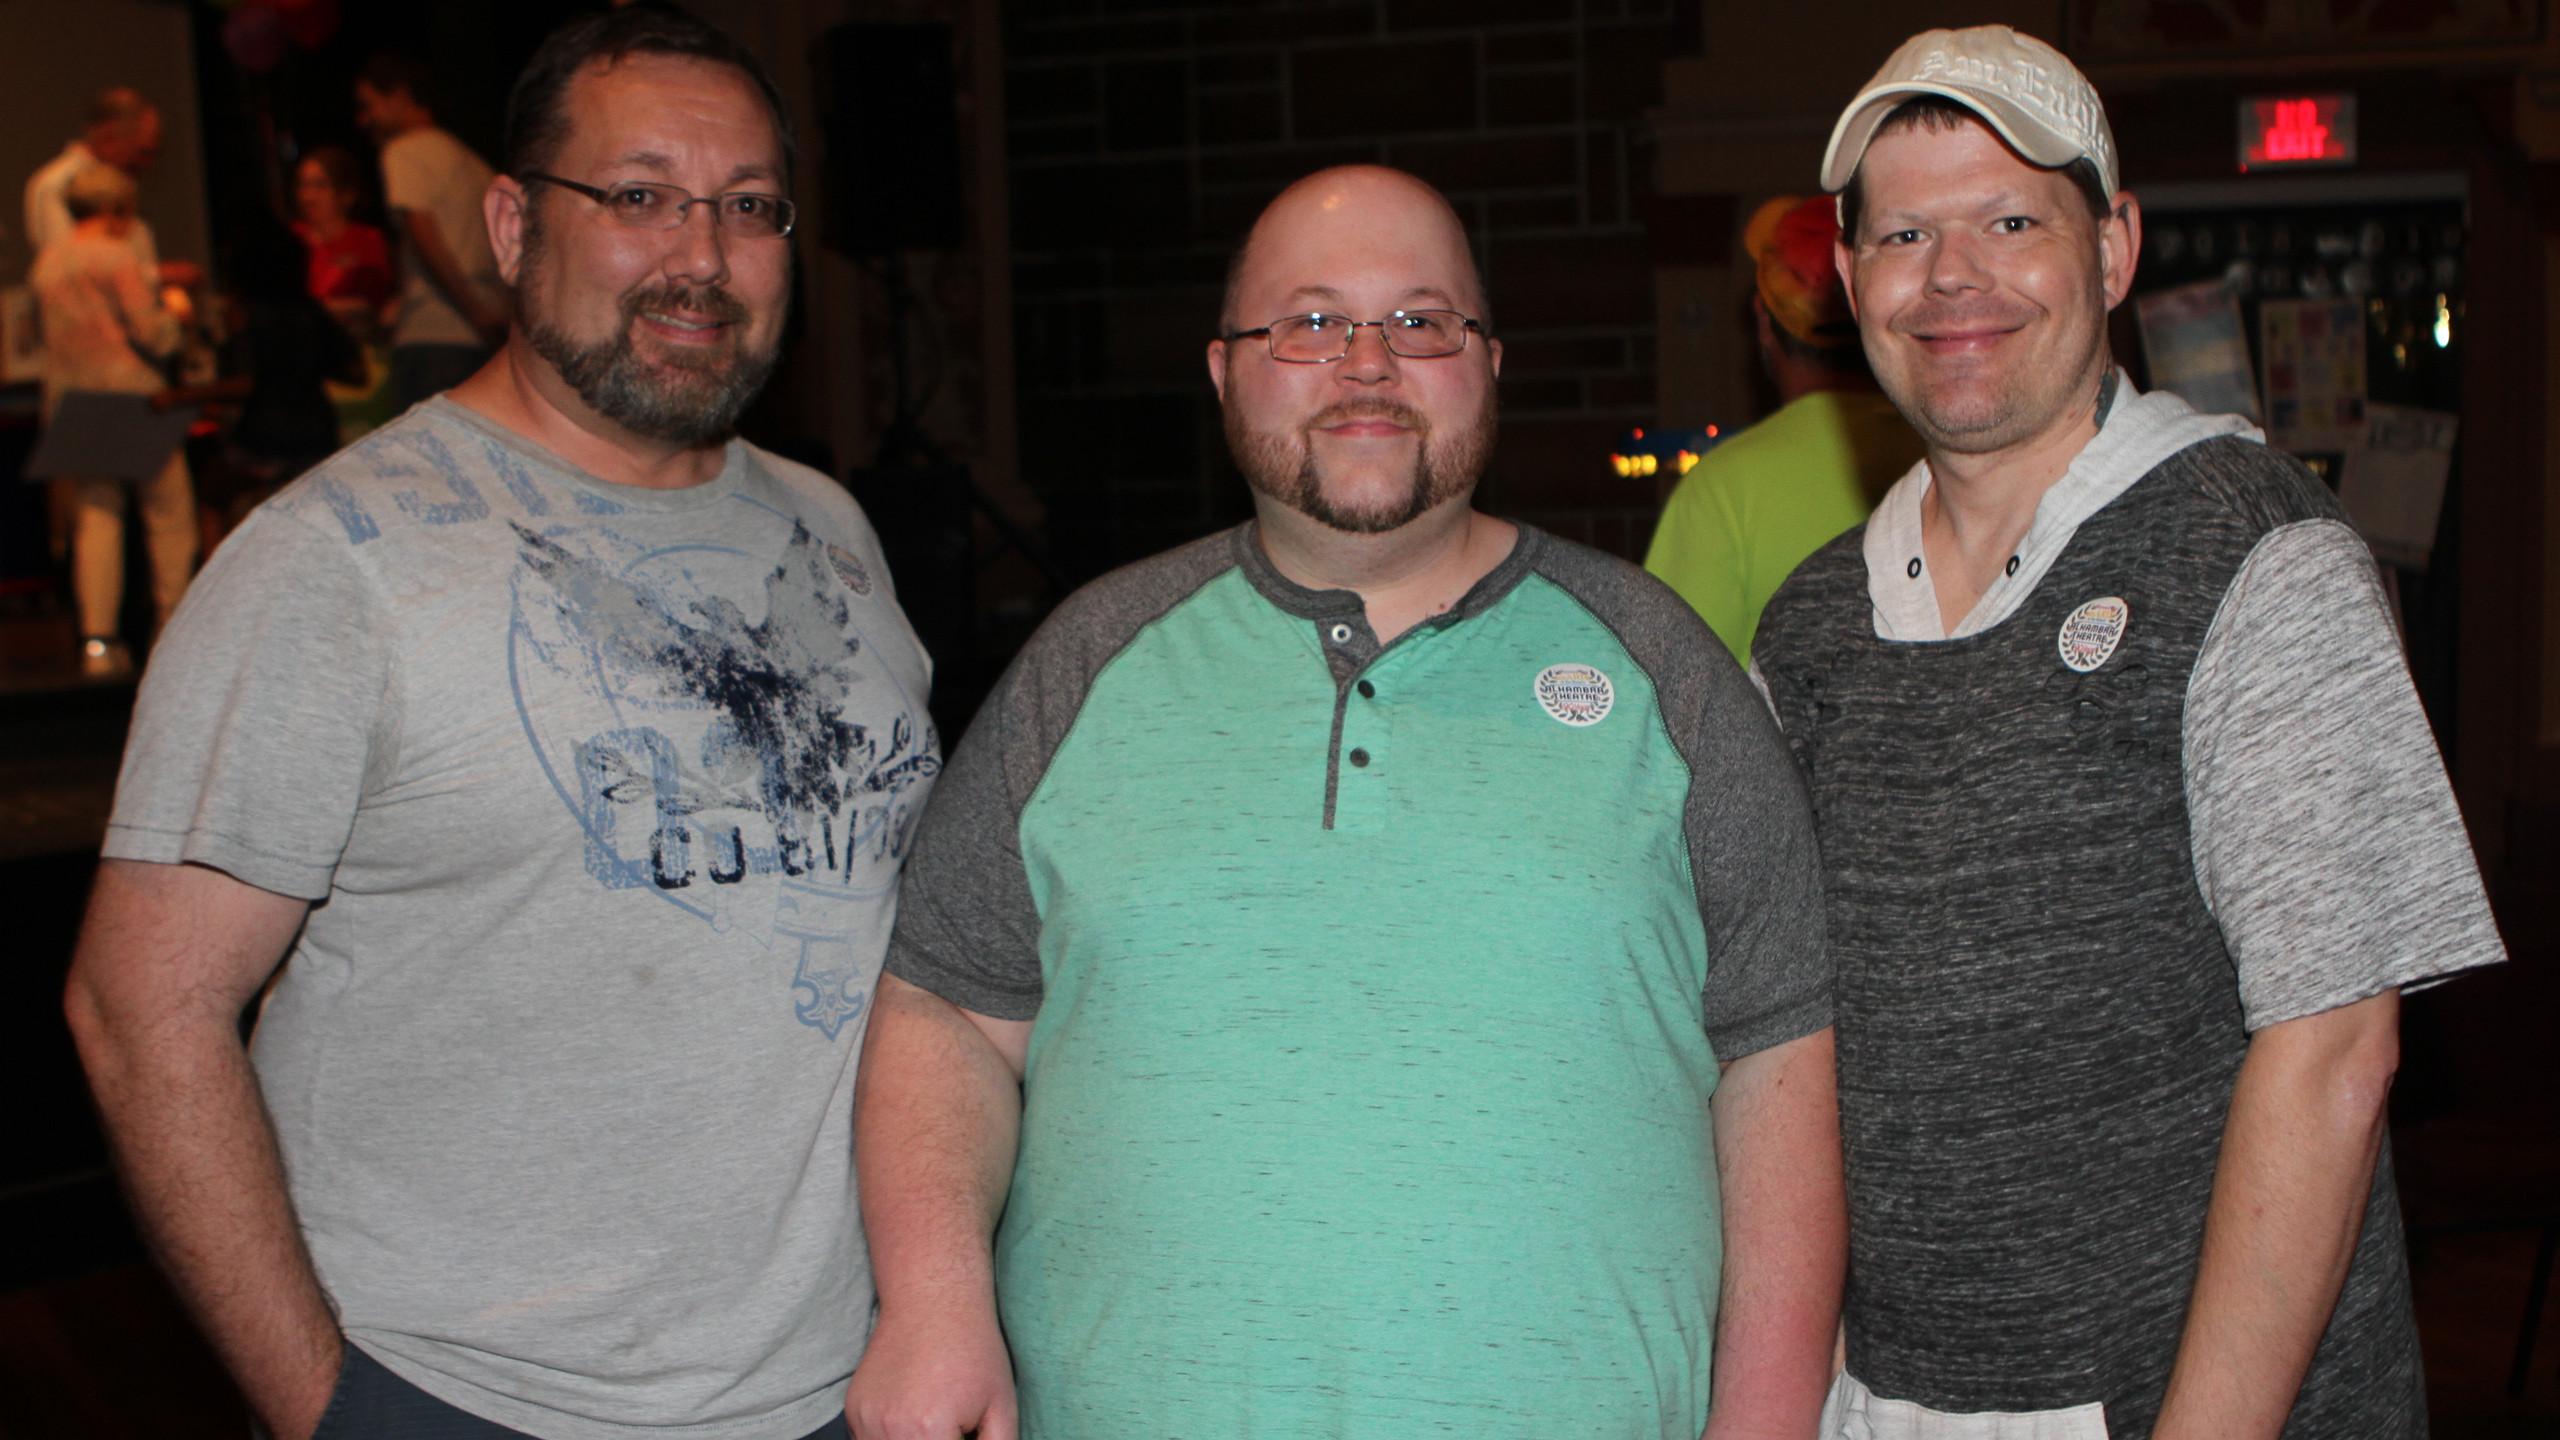 Joshua McGowan, Phillip Scranton, Todd G